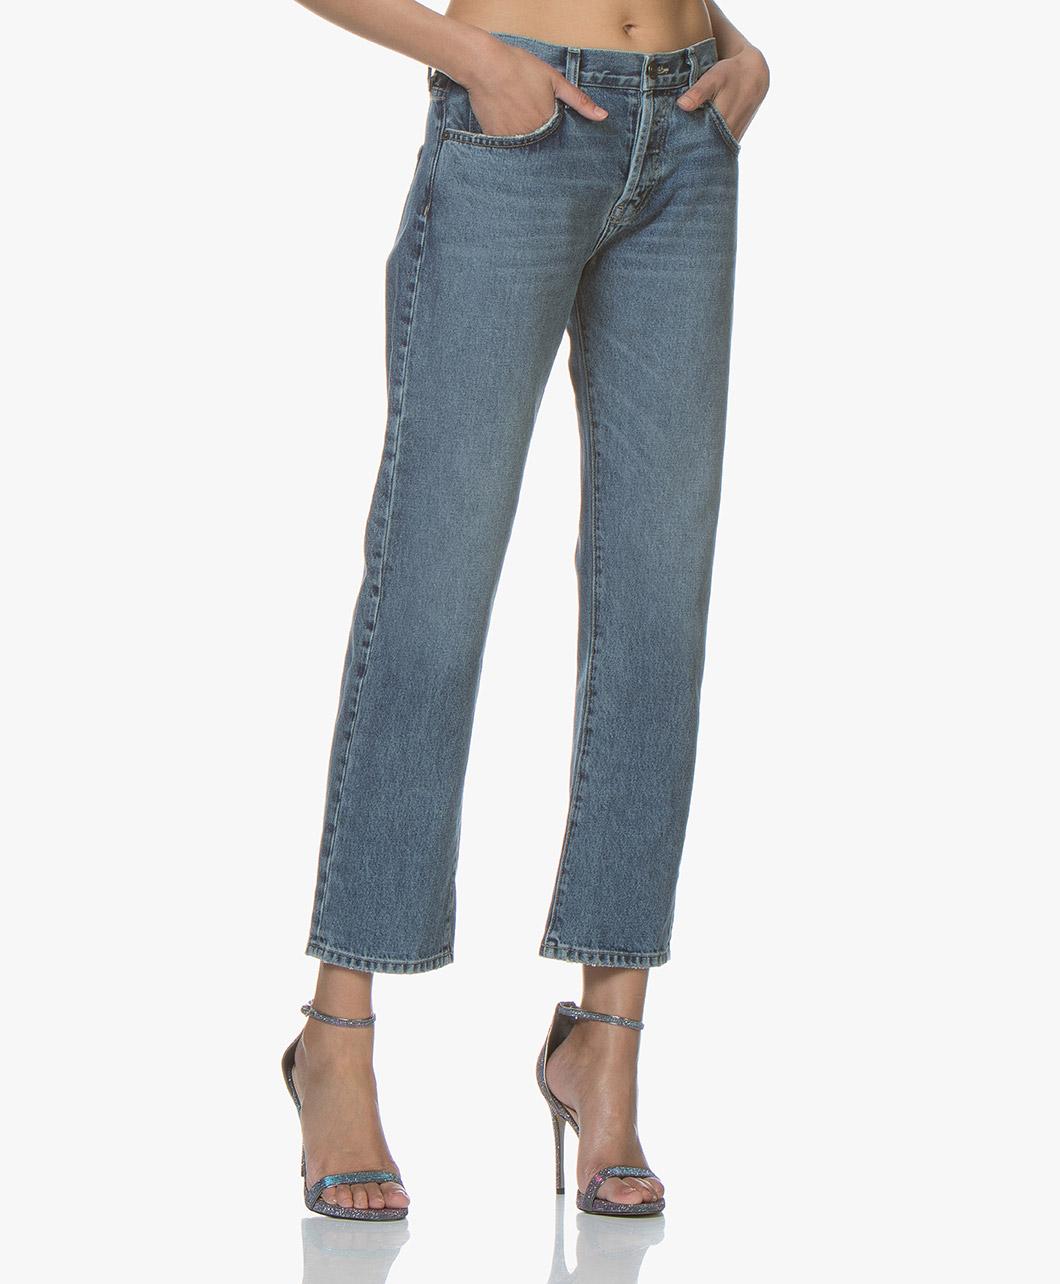 Afbeelding van Current/Elliott Jeans The Original Straight in Grassland Blauw